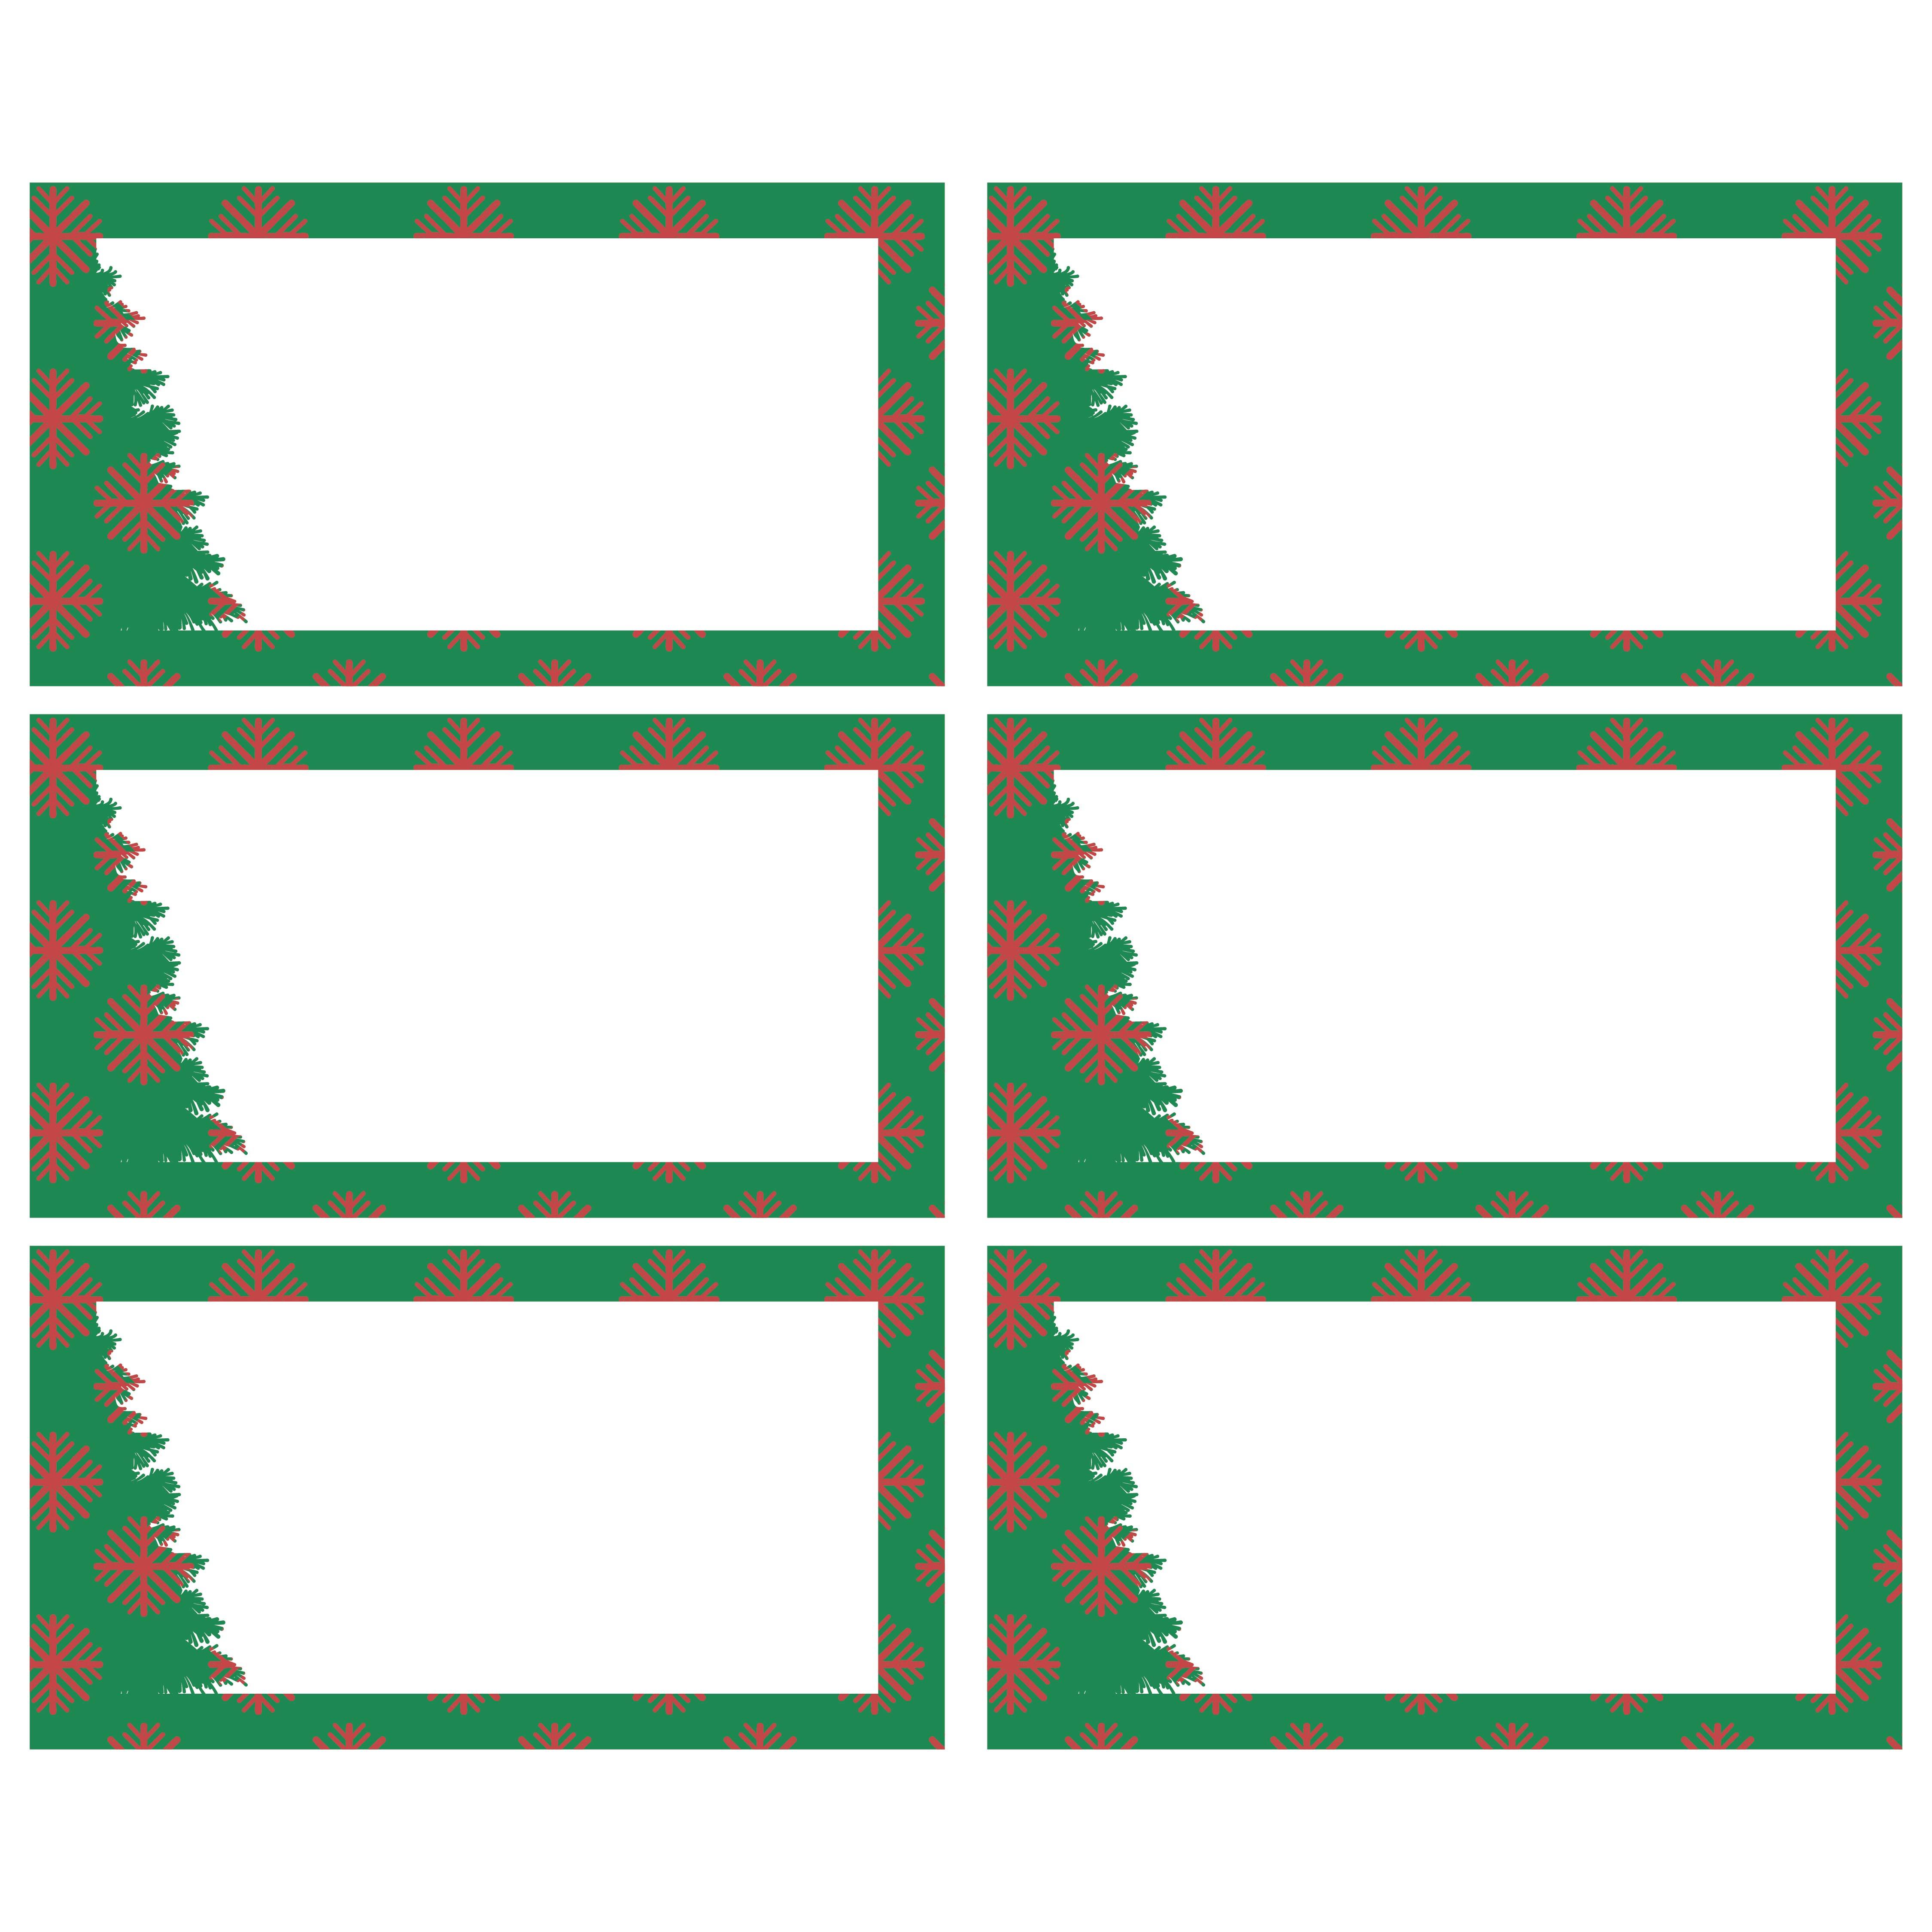 Blank Label Templates Christmas